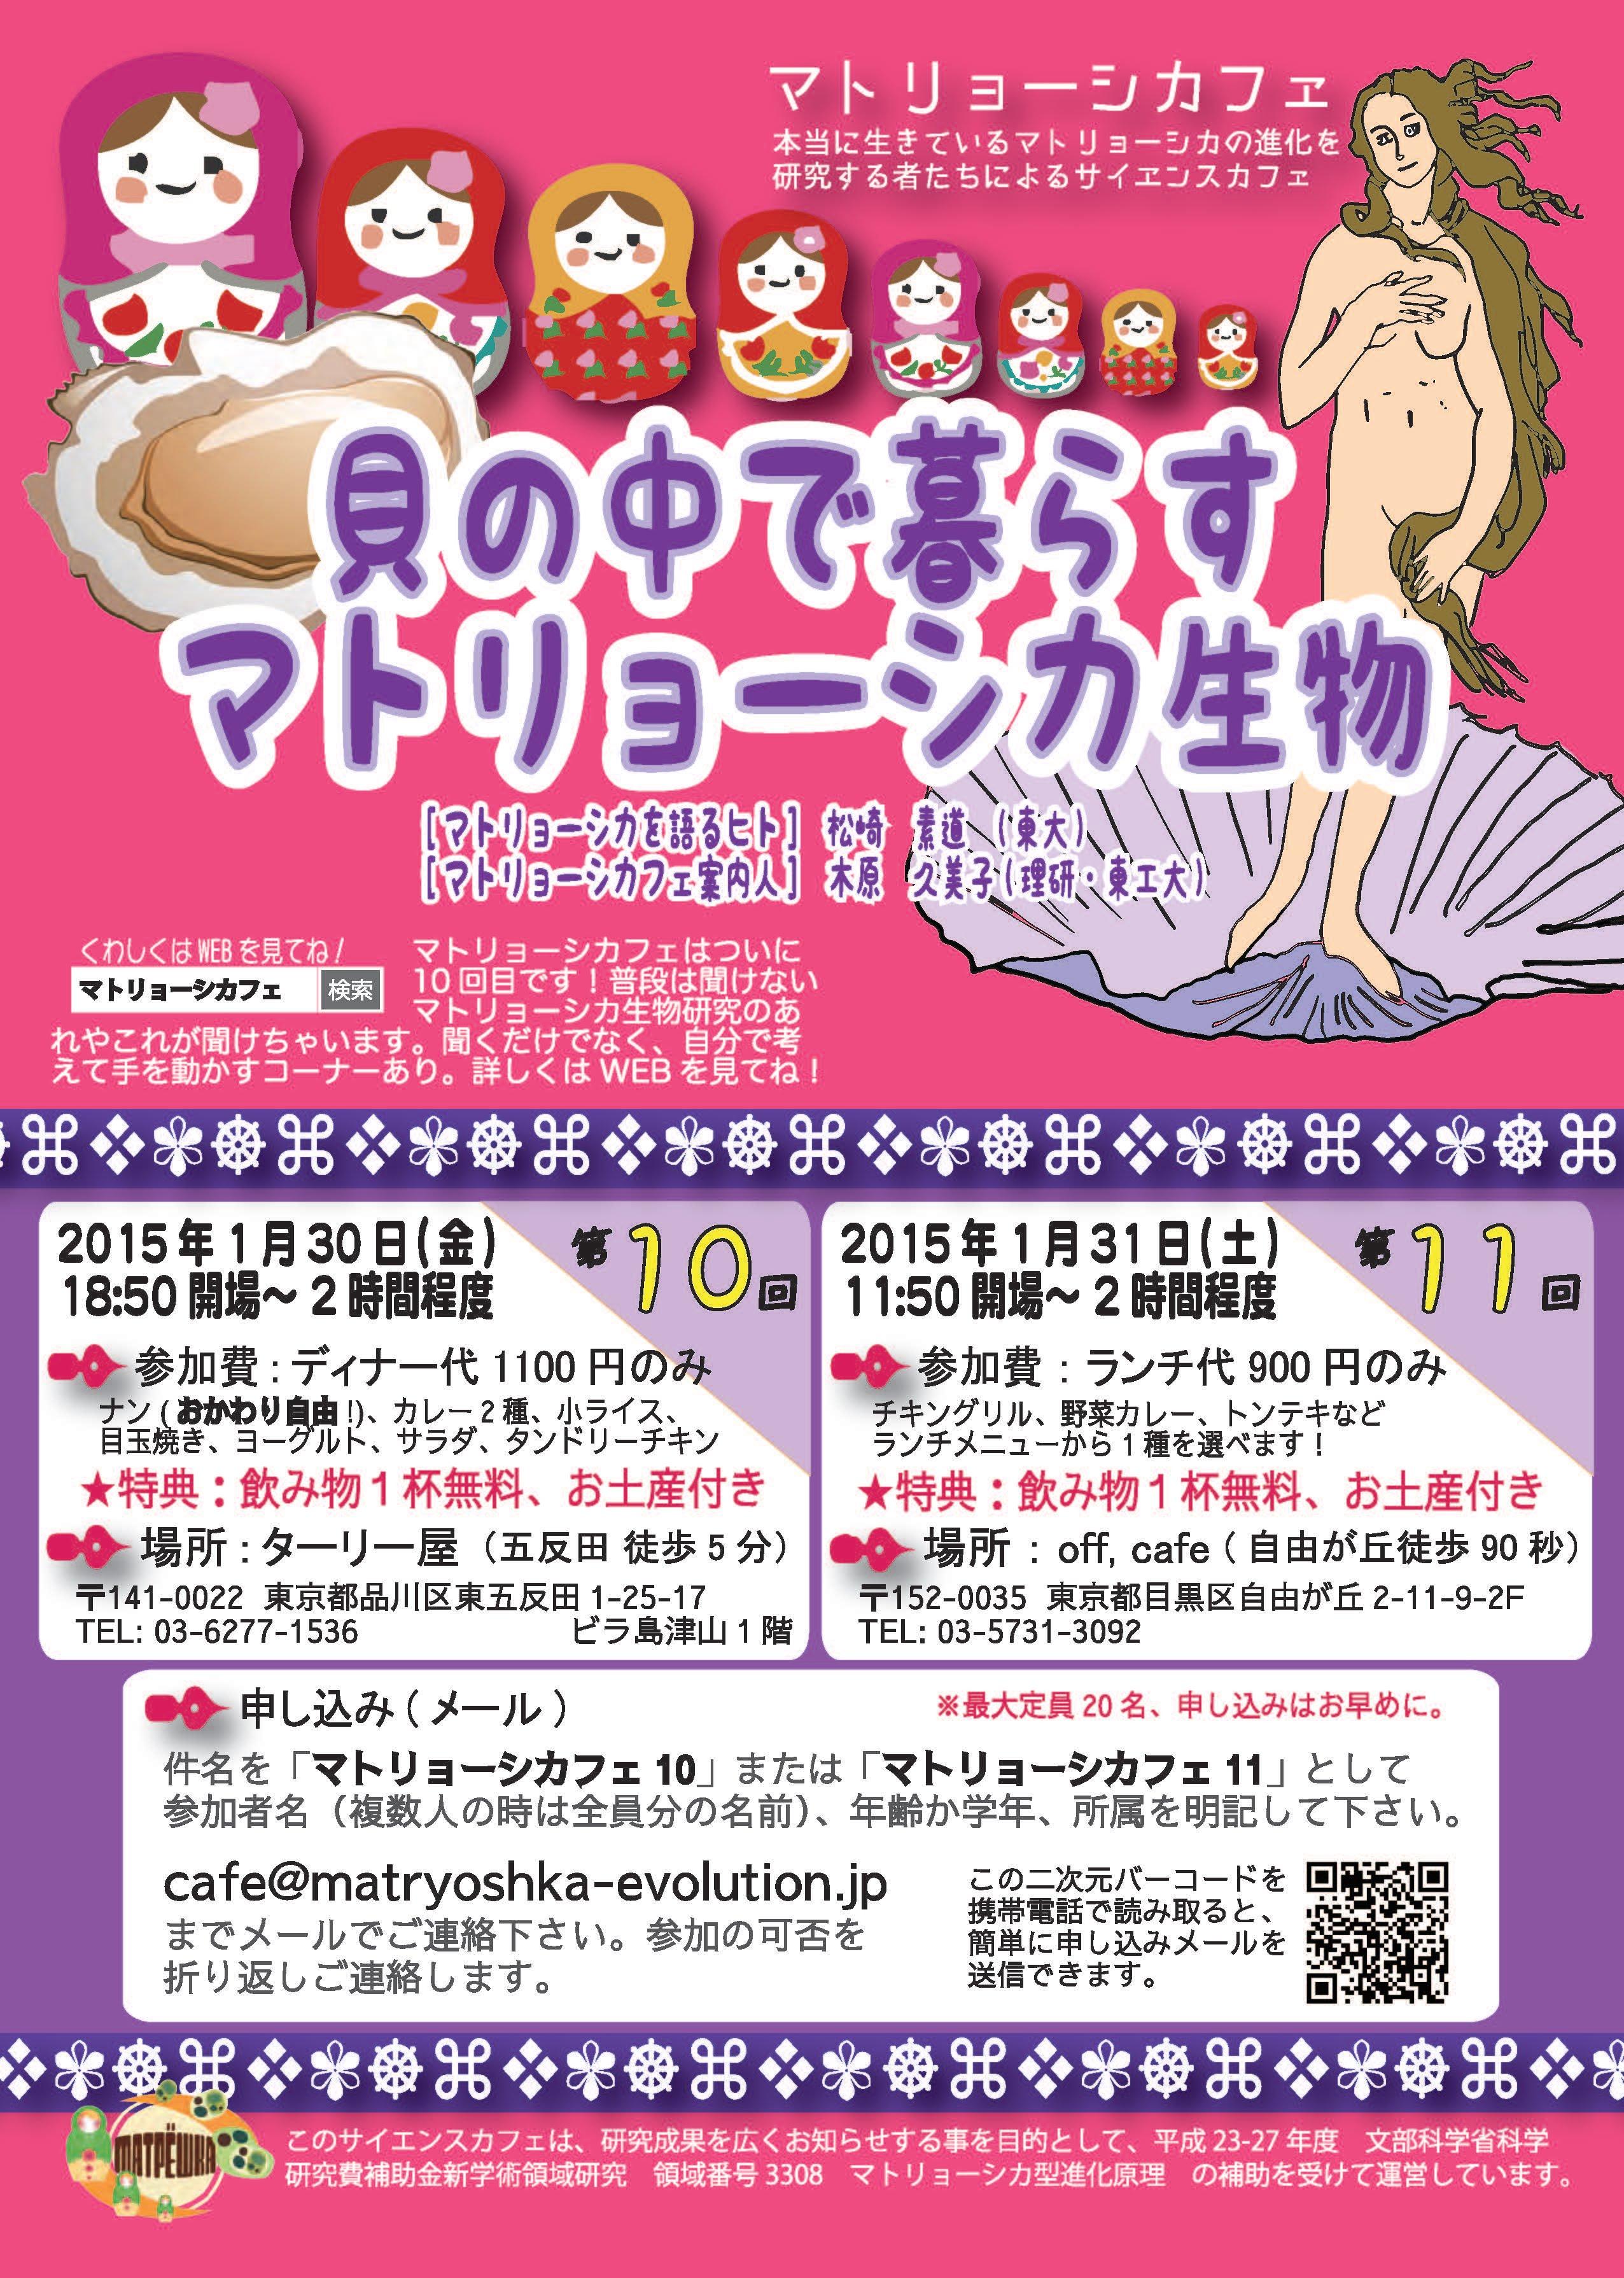 https://3d10e7f3-a-127f7e68-s-sites.googlegroups.com/a/matryoshka-evolution.jp/matoryoshikafe/matoryoshikafe-kai-cui-qing-bao/20150130_ちらしmcafe10-11_ver02_out_s.jpg?attachauth=ANoY7cpFRer_ZwOirl52VbleoheJrR9s_9Z5dgInJUHre4vrDc8OrhCr2TisvaP9R7JONtoPd4MTPVva-lYId1UYvFf2BvY1zDB_psIbxGyC2VbcT1pcfPaGrdmgCWoMp6mxEgw0UDjCylhxoJwojEoSQaBYWwUaSnvGkmd_WNxoBcMnqc8045pZlNzOpdQix5e-OKFbgT94iWd72TXBh6u-9mTXXRdEJTgtKdzu2ciCoZsZ-5vyAw-pfTkcxEZl60khEM1ci5r4GQ3DRrQuqp7h9TWBxuMhe9OO5qYNAIb1xLu1sgls-5pA5saCuhcErPo8fswyj9PqwED8-D7BsvXlLxZMT5eKgg%3D%3D&attredirects=0